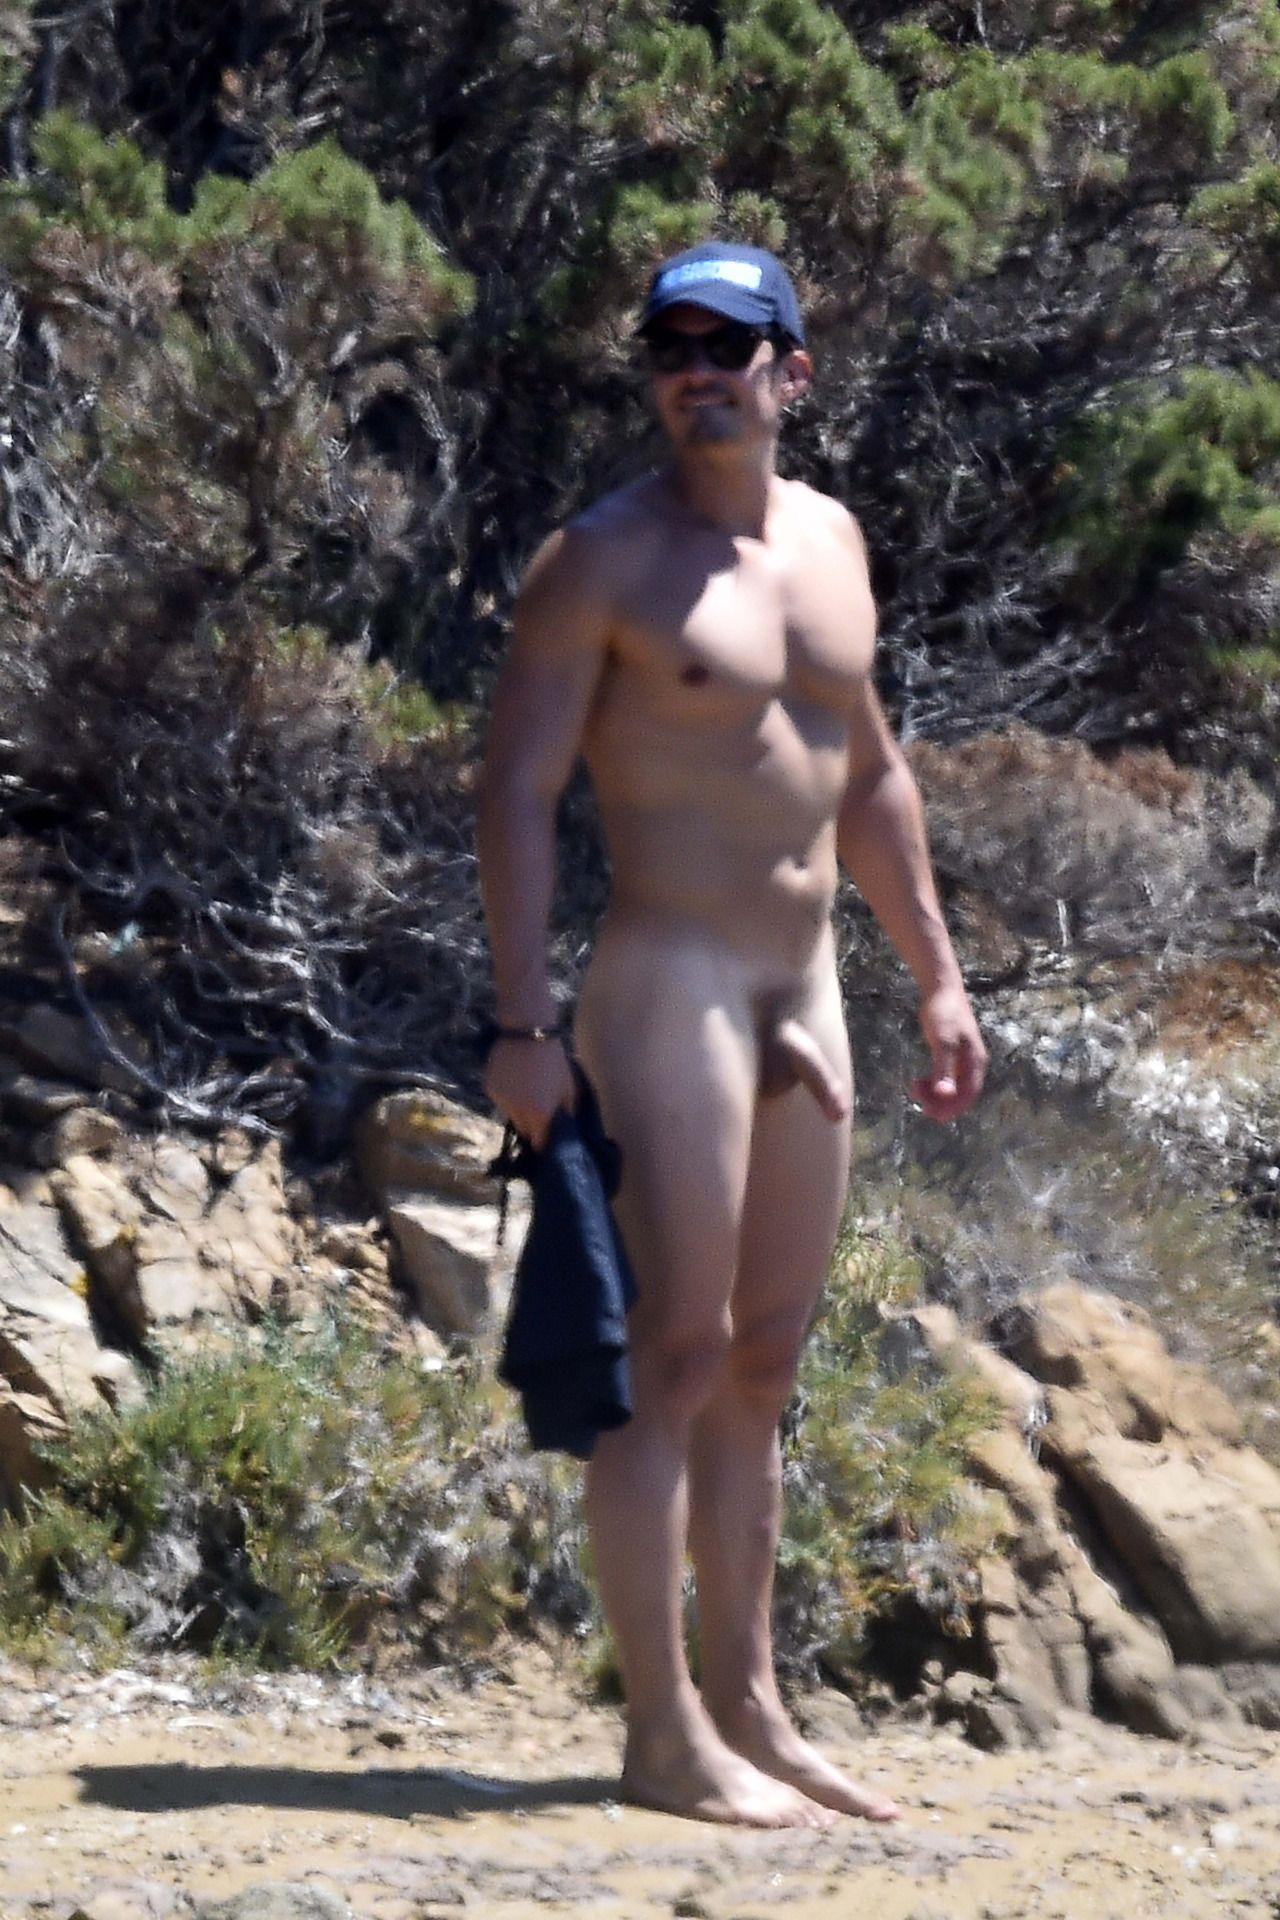 Softcore porn no nudity